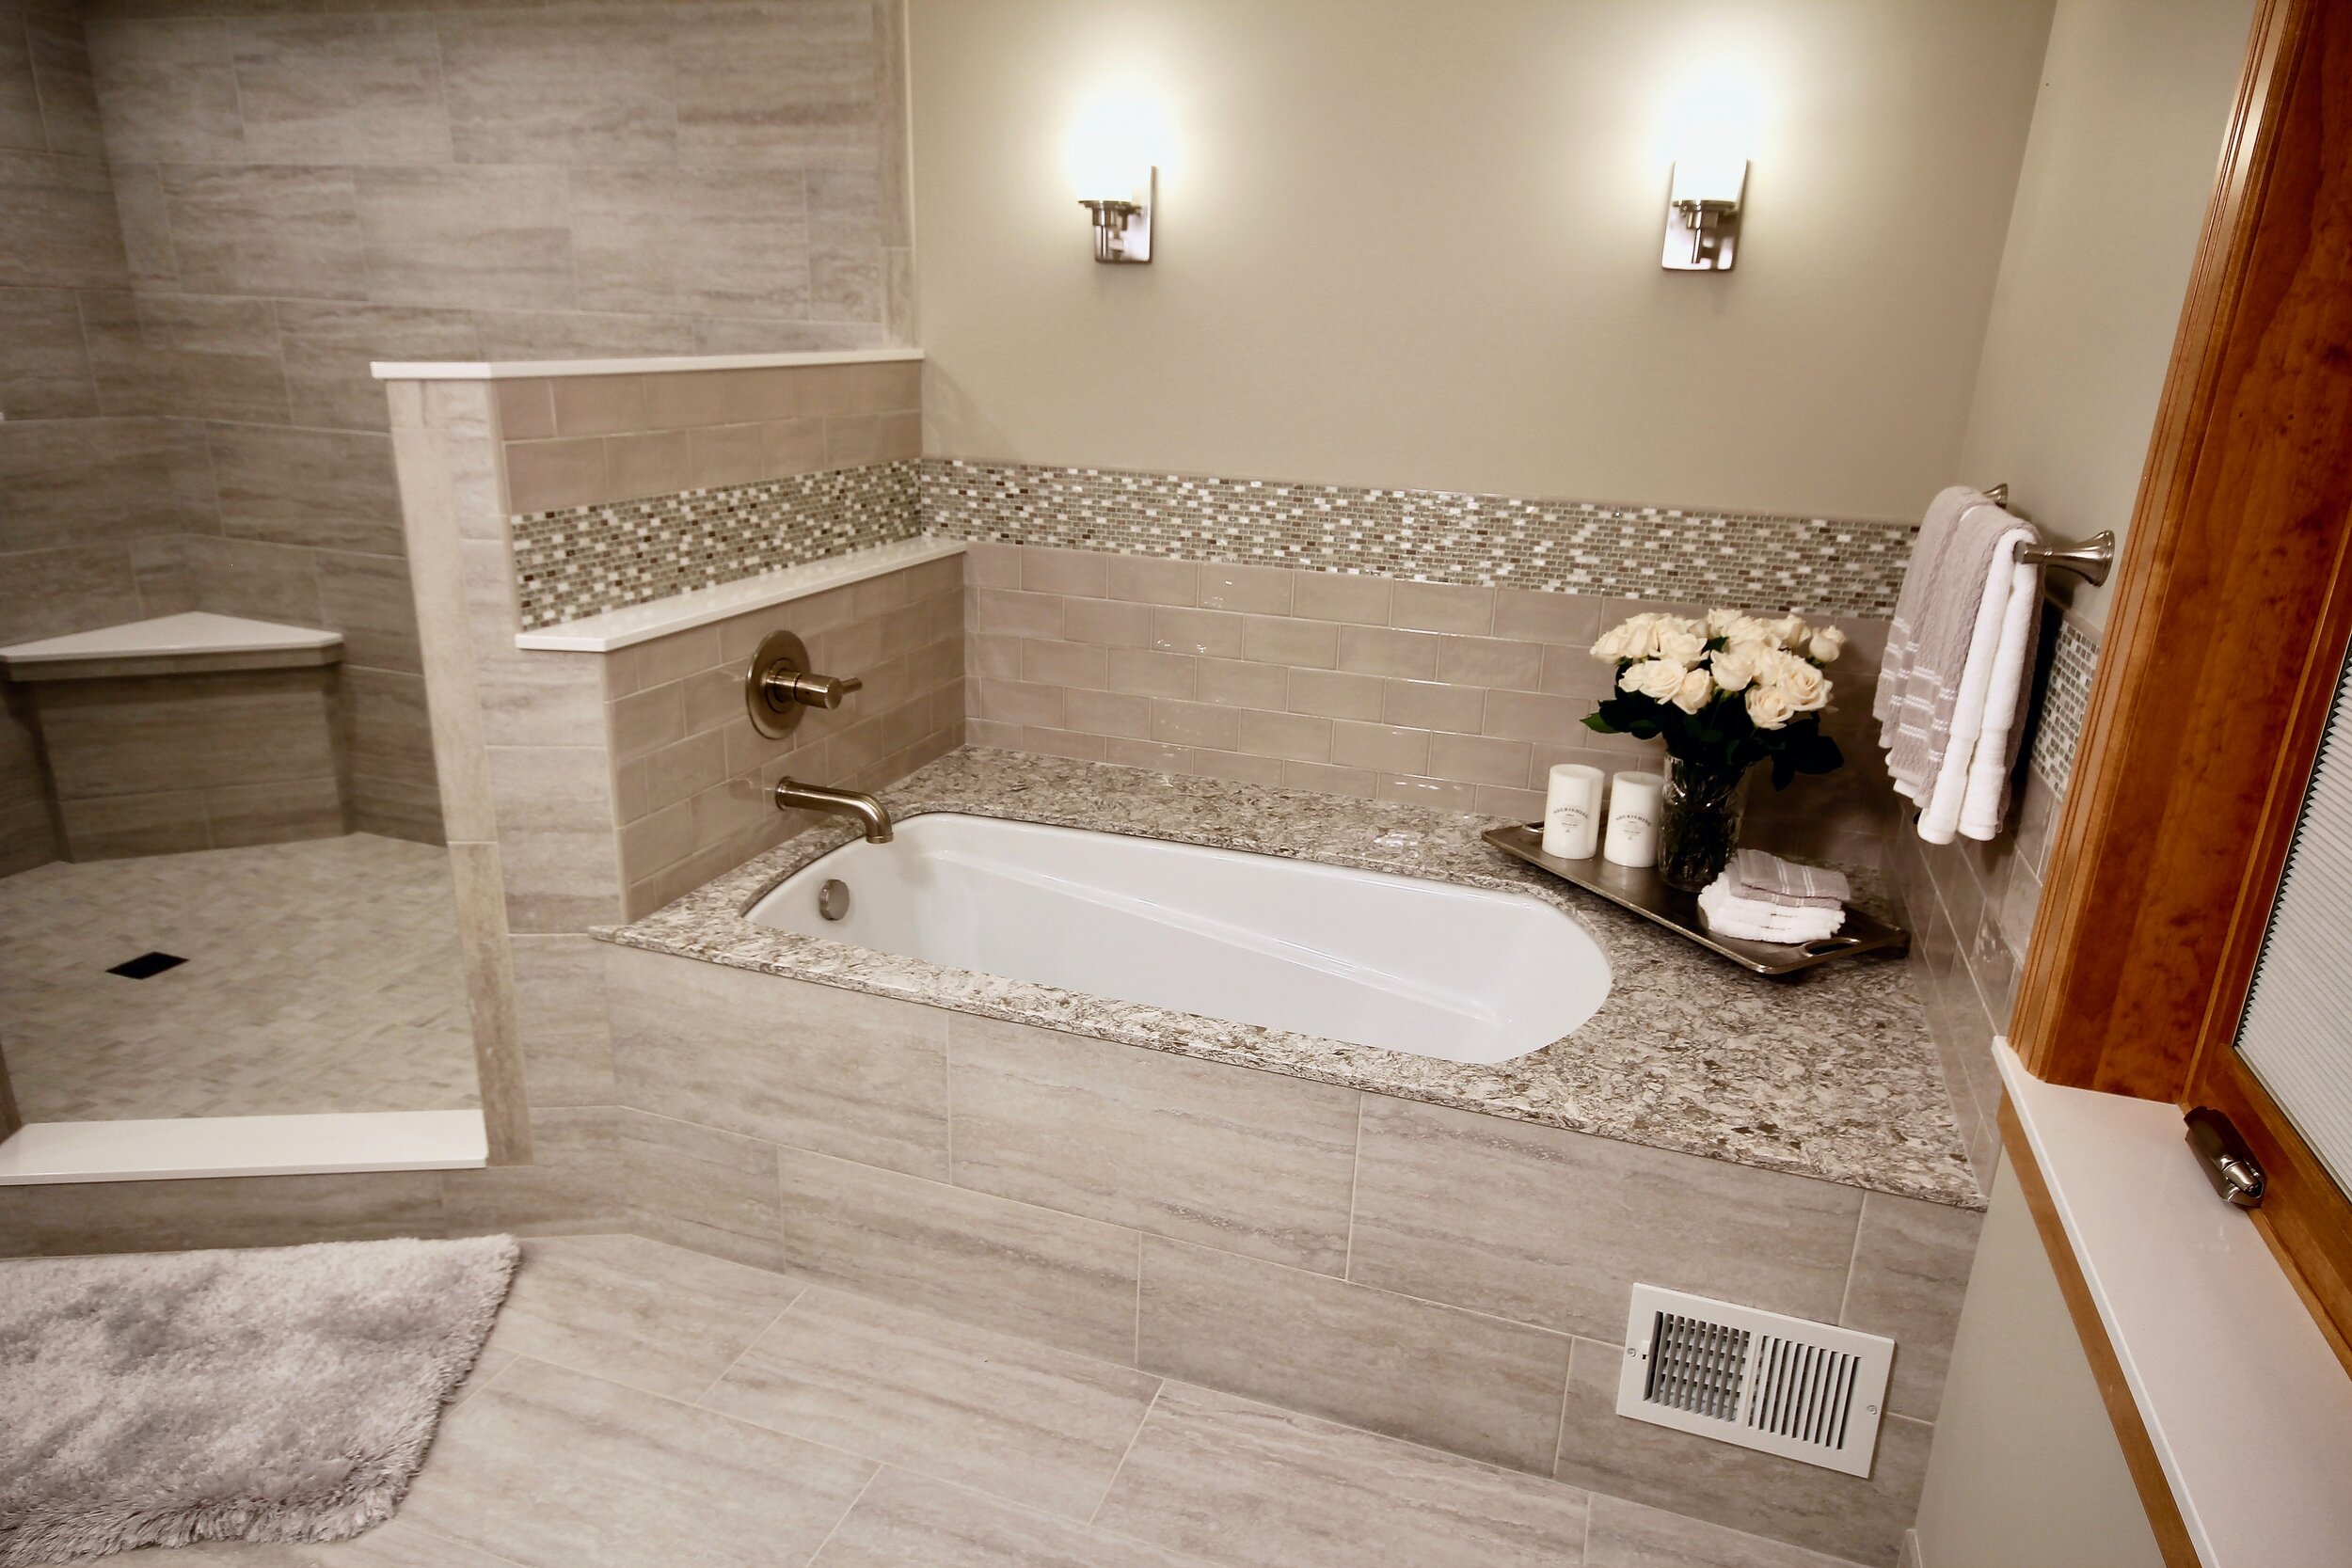 Comfortable soaker tub